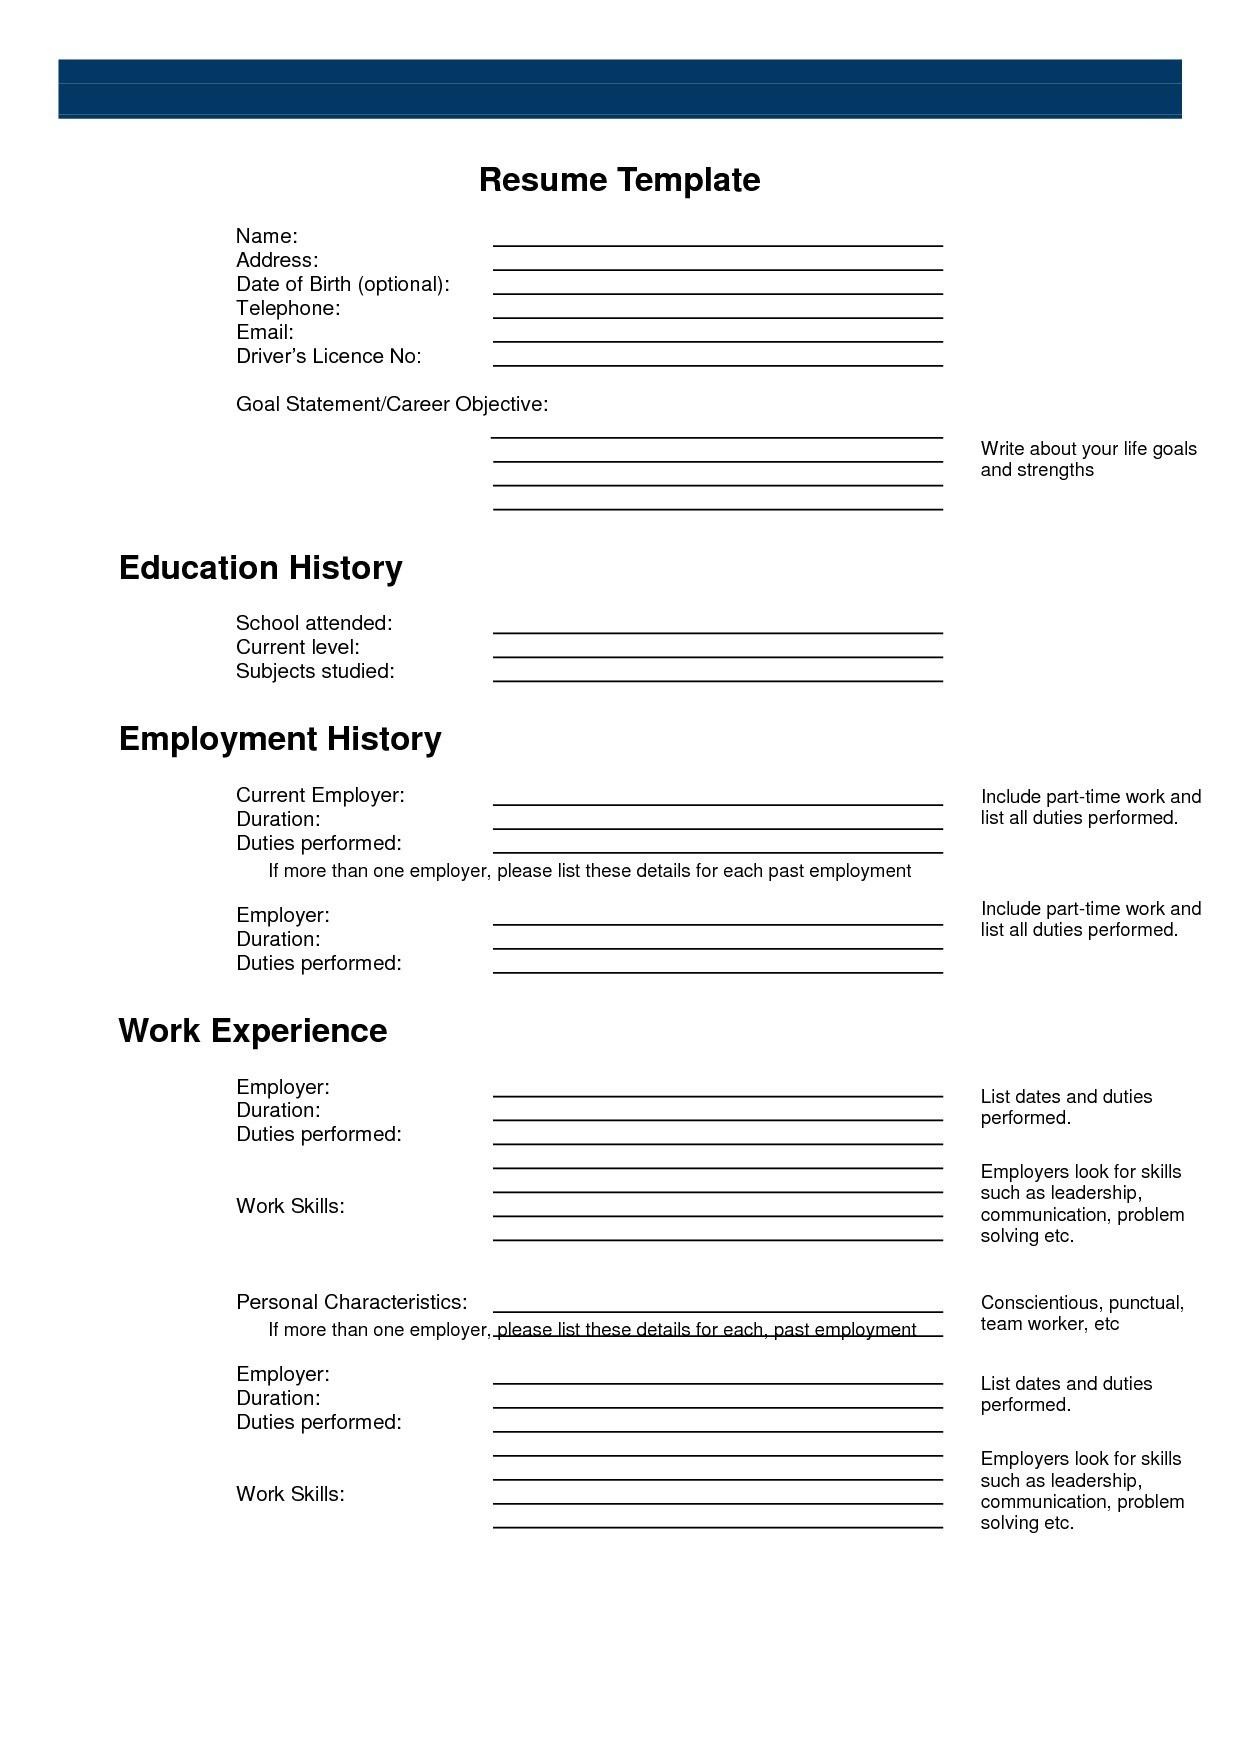 Printable Resume Form Surprising Inspiration Templates 2 Sample - Free Printable Resume Templates